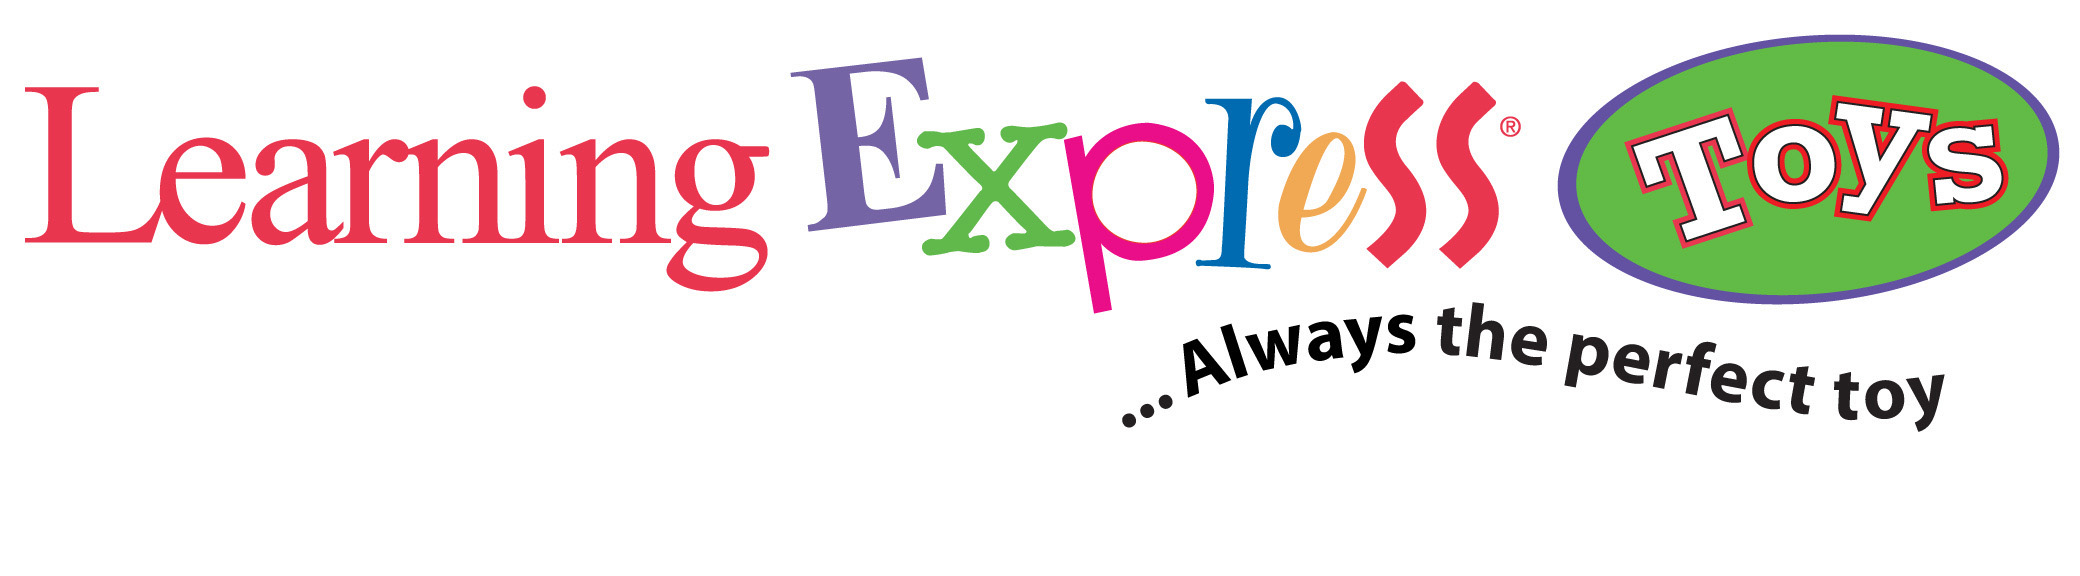 Learning Express Toys Logo.jpg